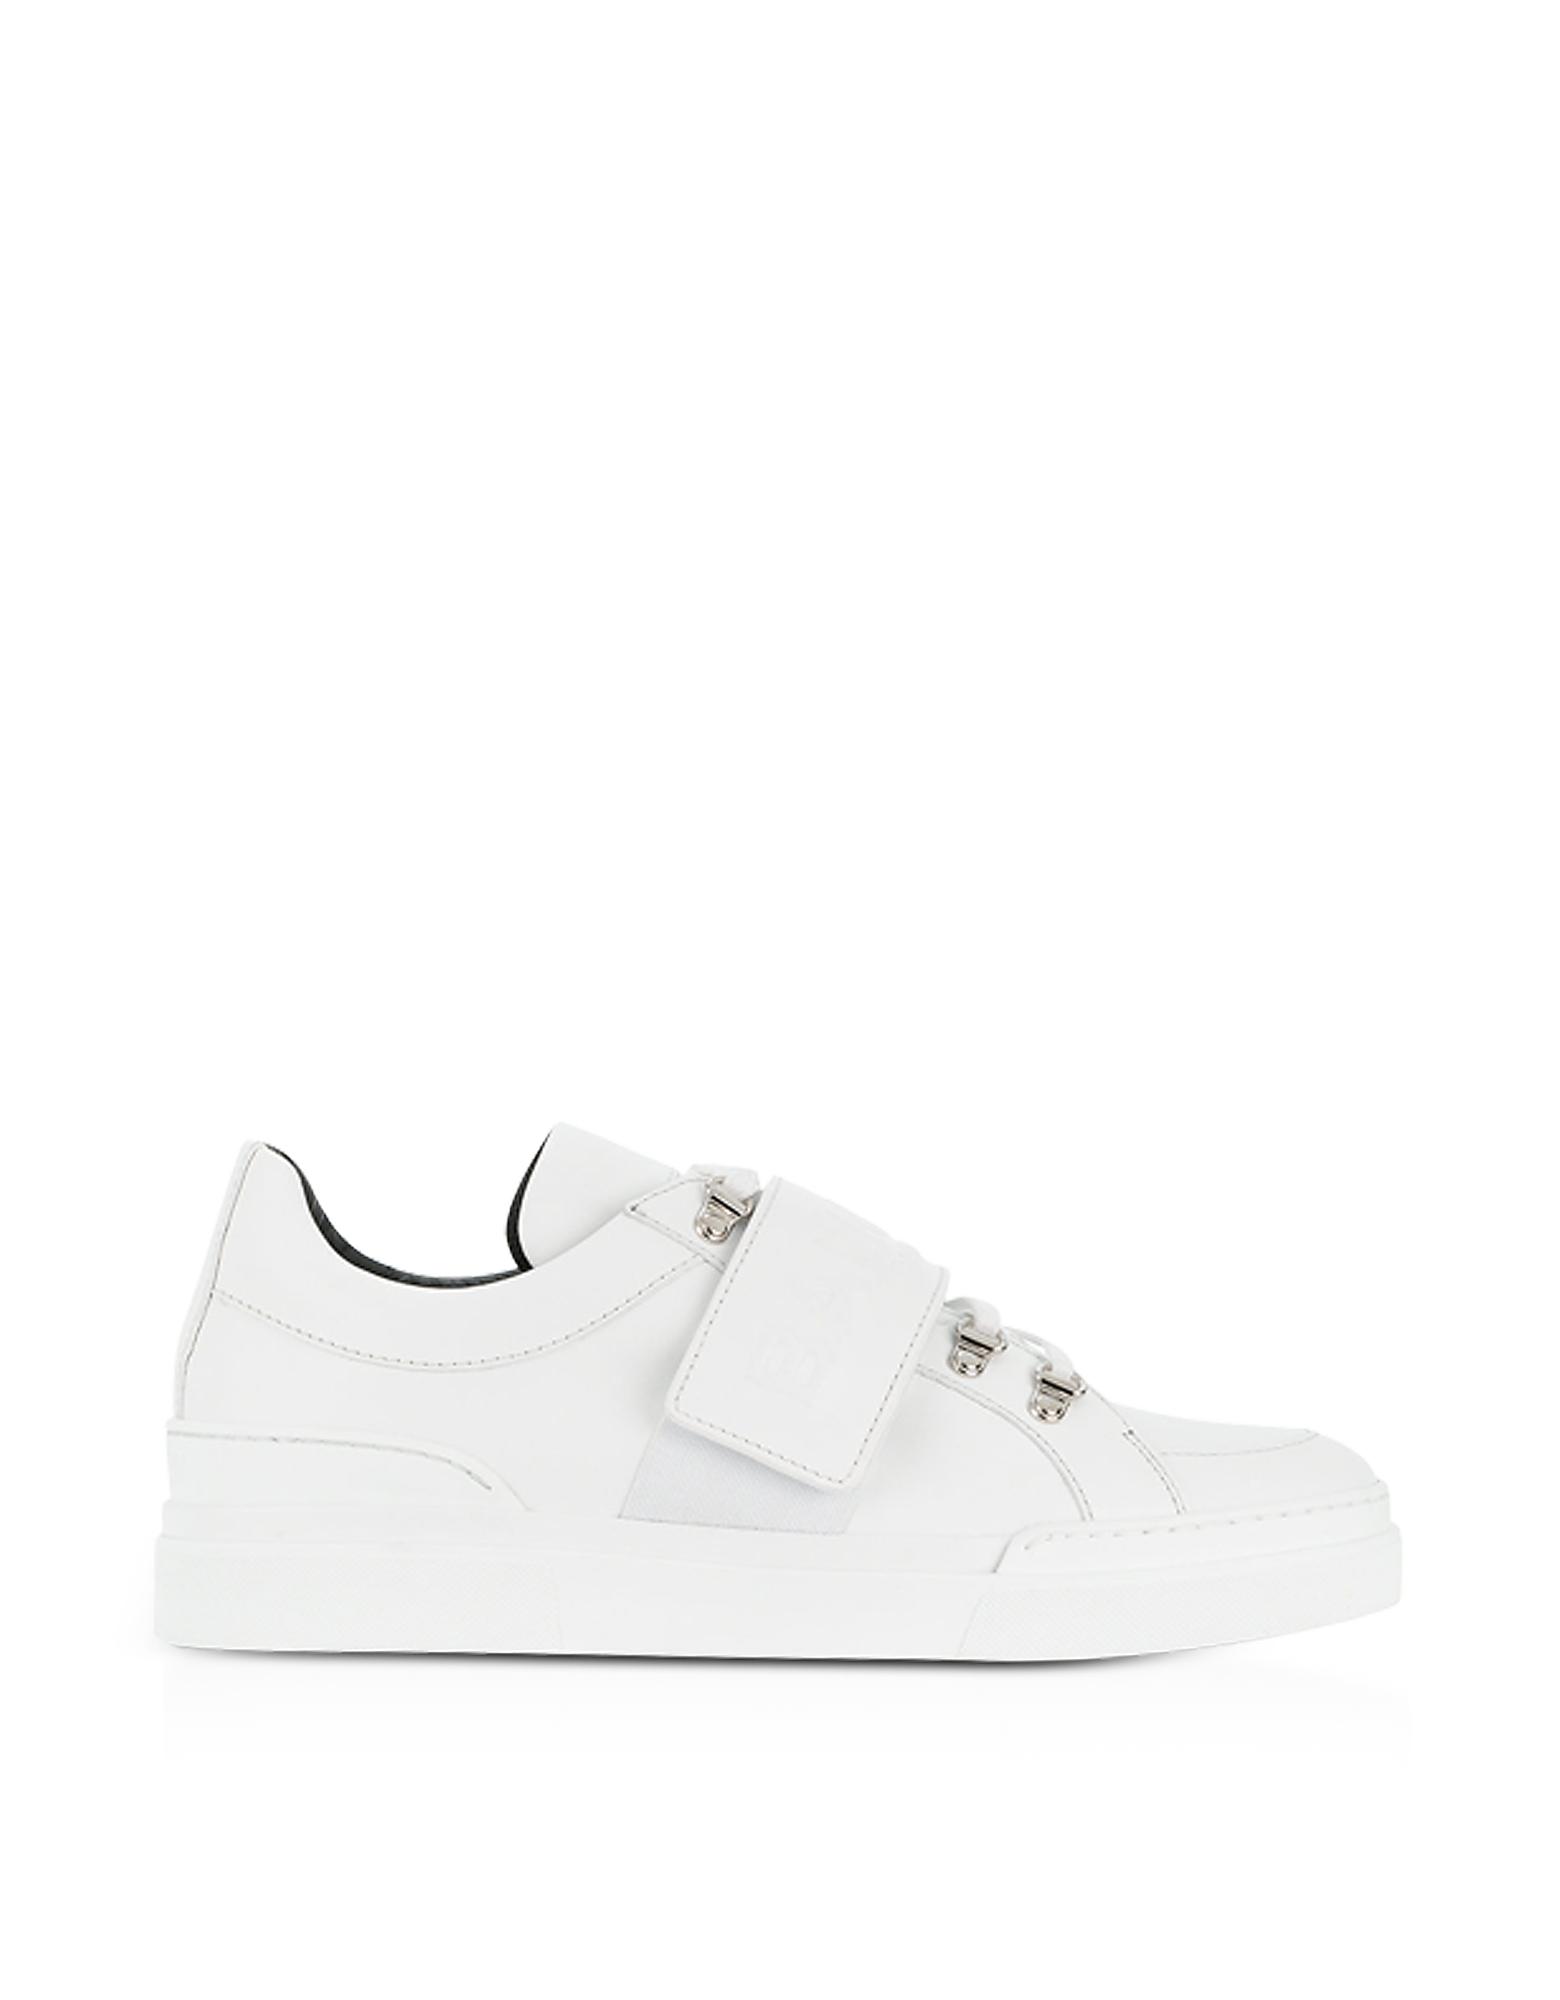 Balmain Shoes, White Leather Low Top Men's Cobalt Sneakers